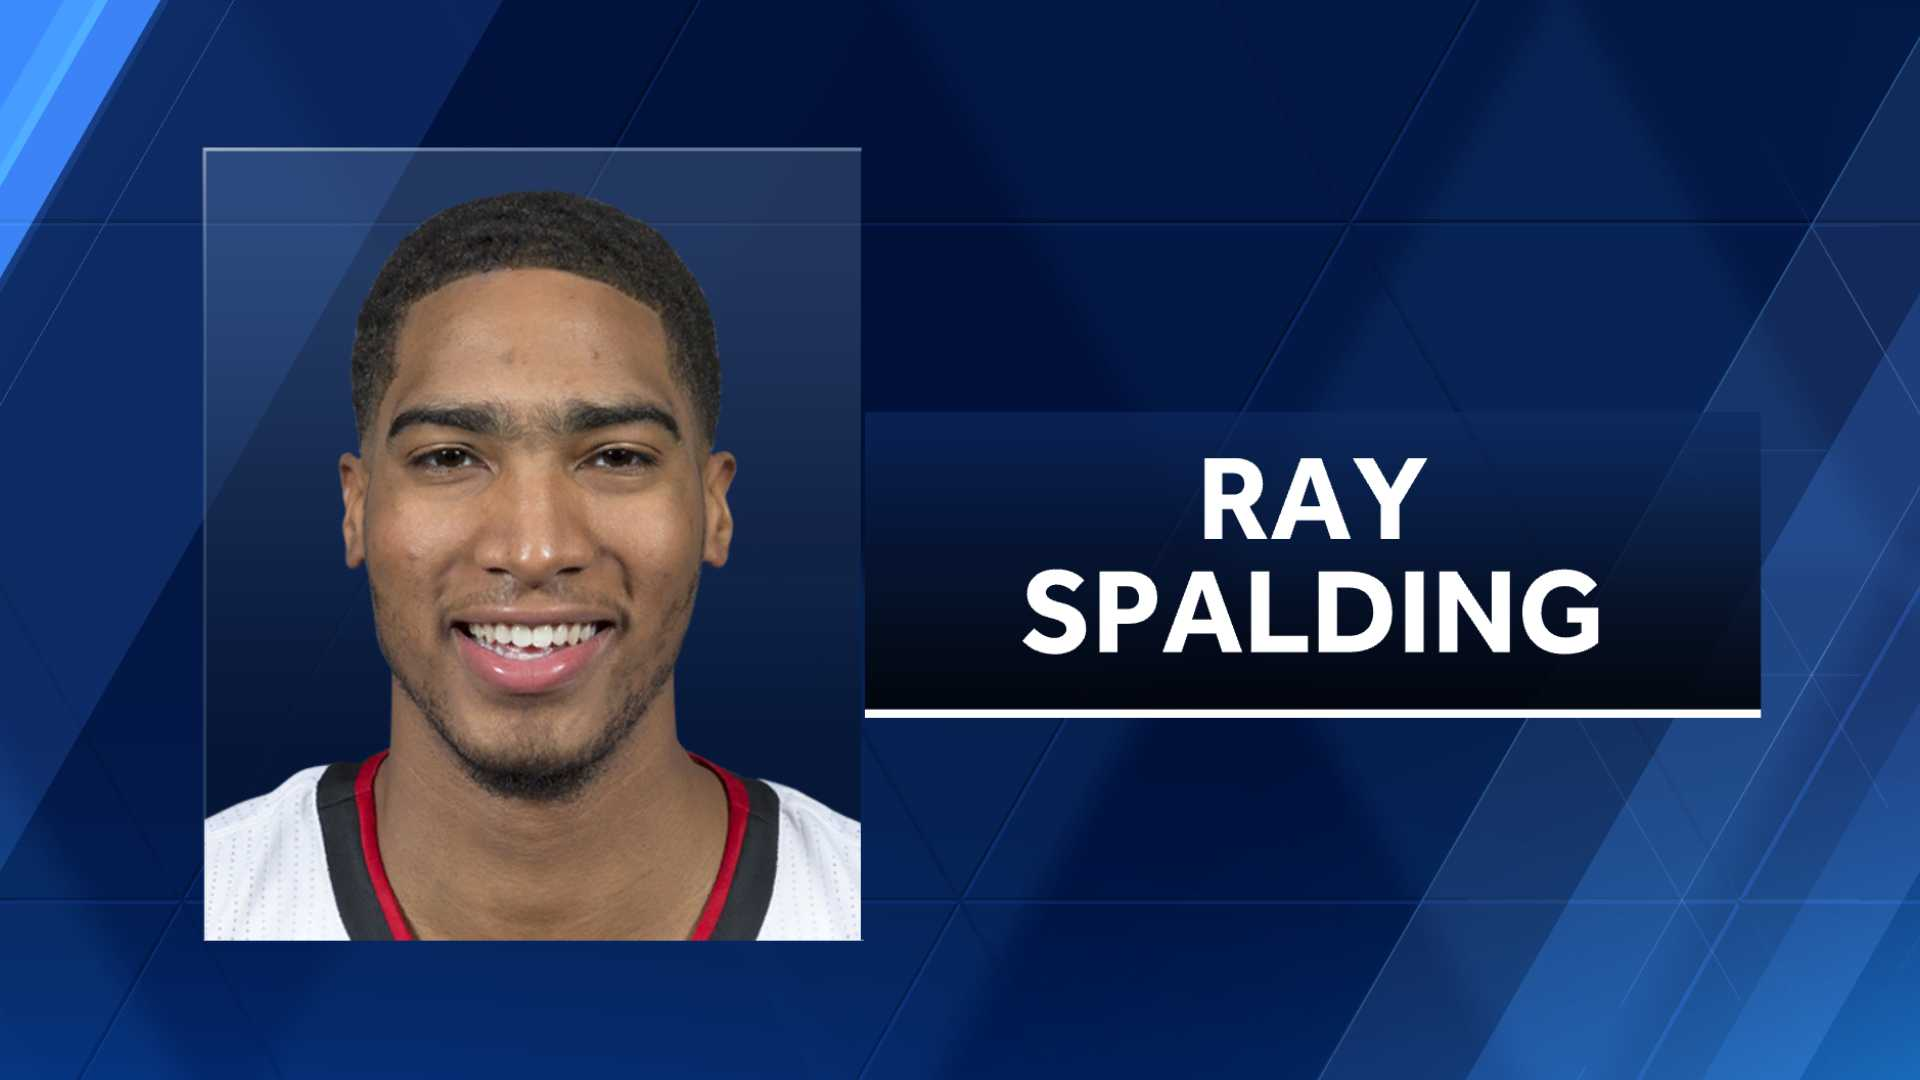 ray spalding